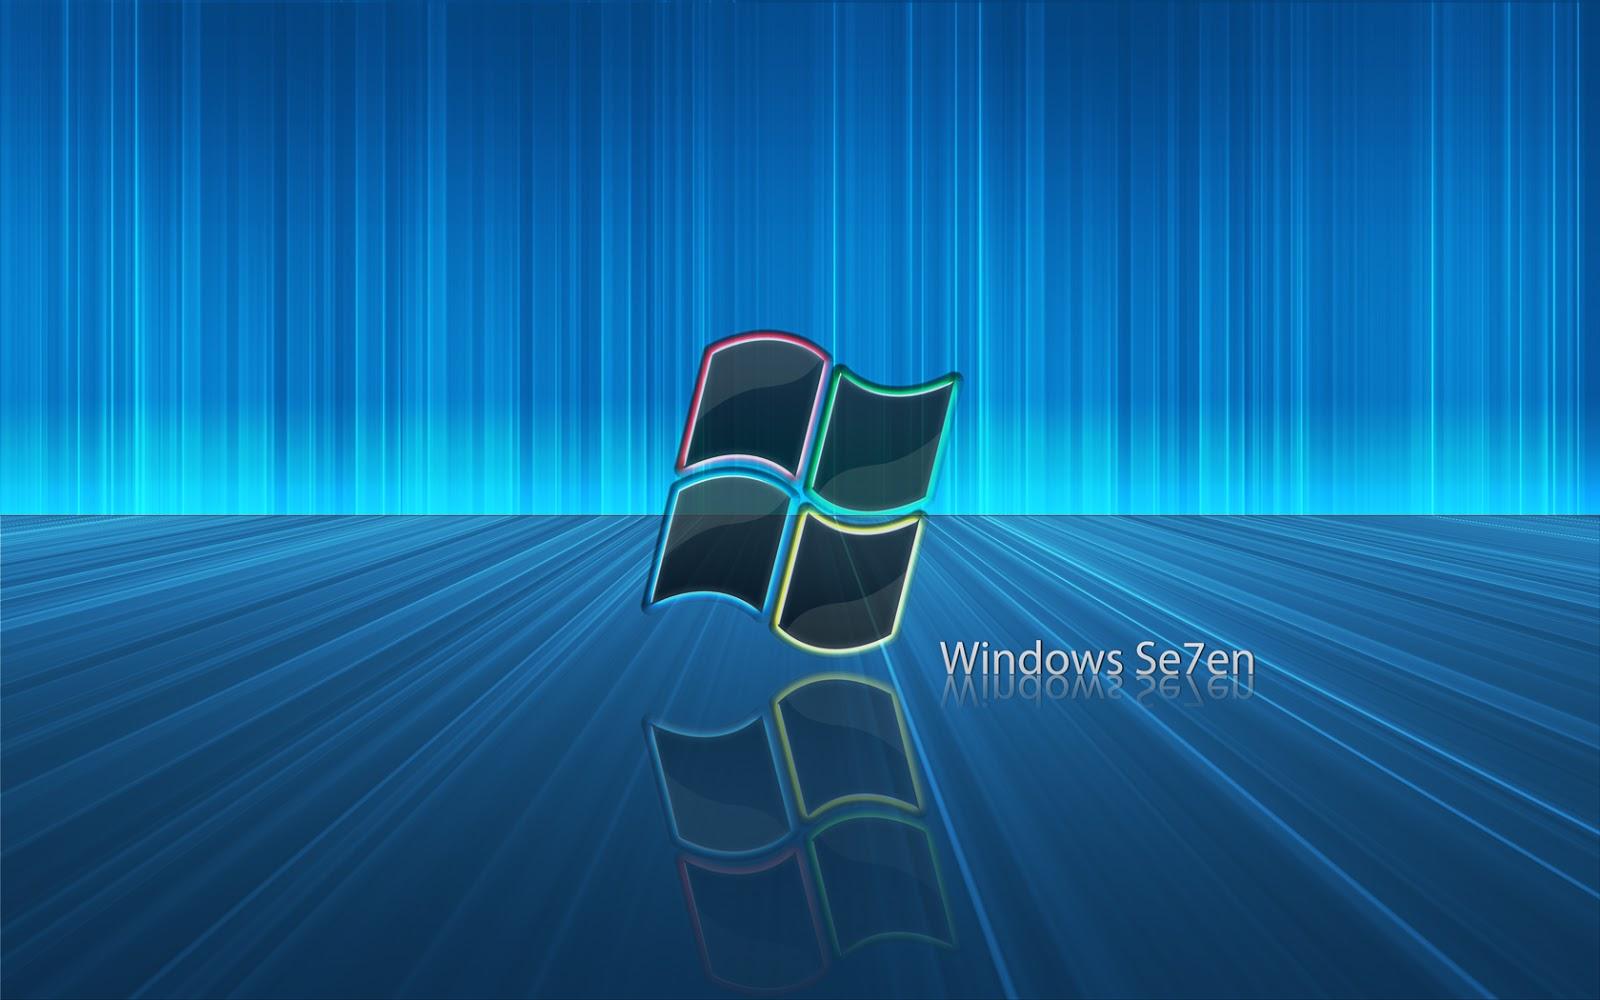 windows 8 full screen picsmicrosoft windowswallpapers of windows 7 1600x1000